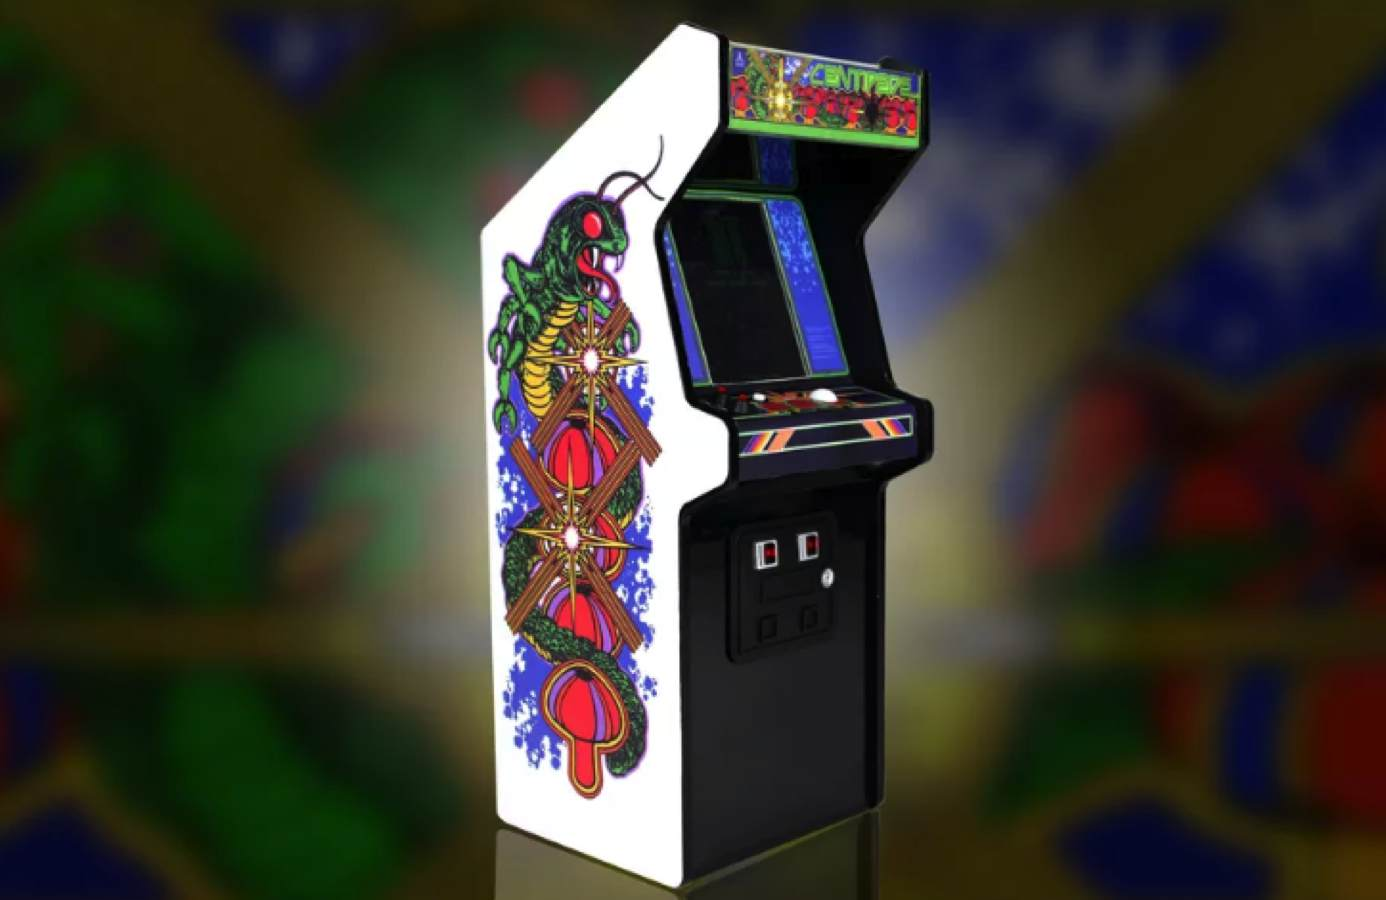 replicade new wave toys centipede arcade cabinet